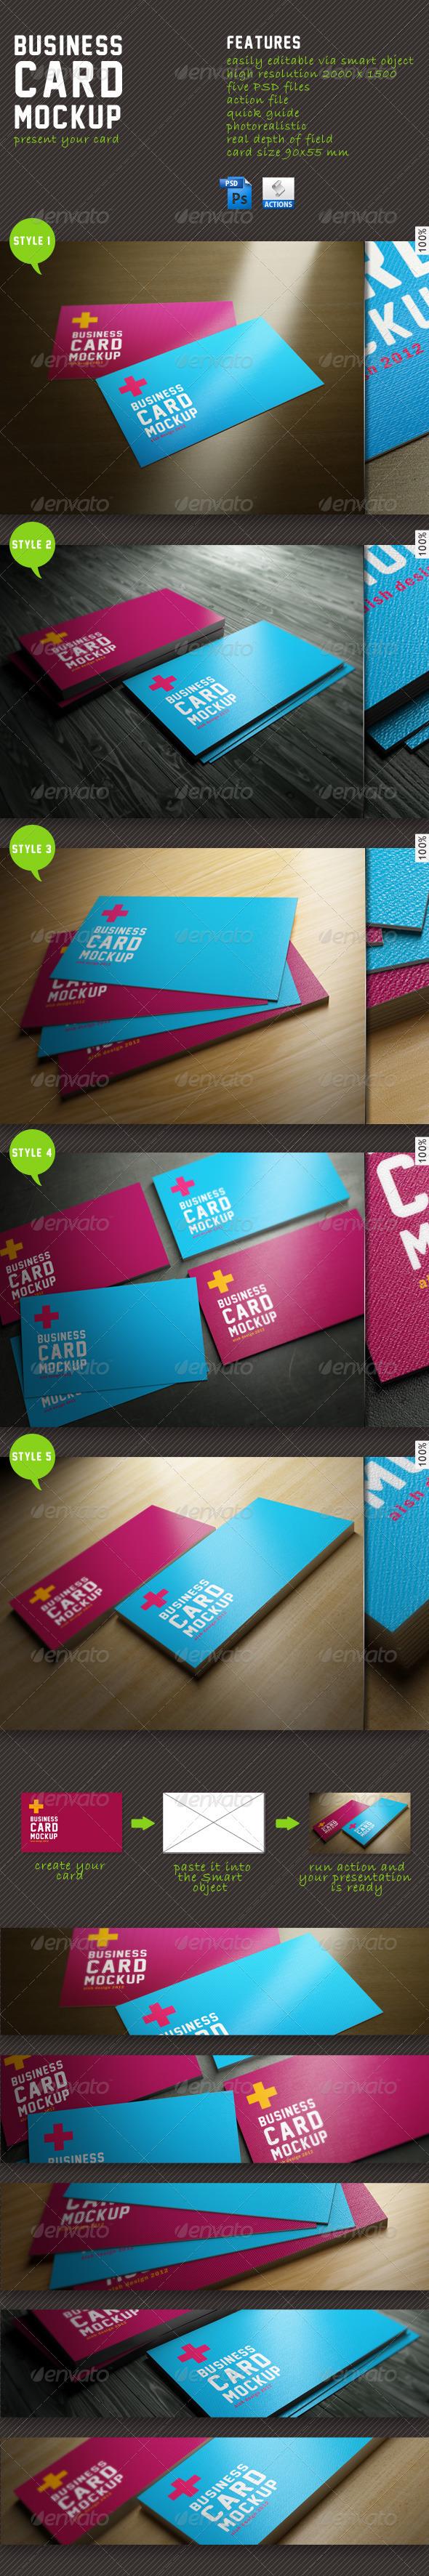 GraphicRiver Business Card Mockup 1854829